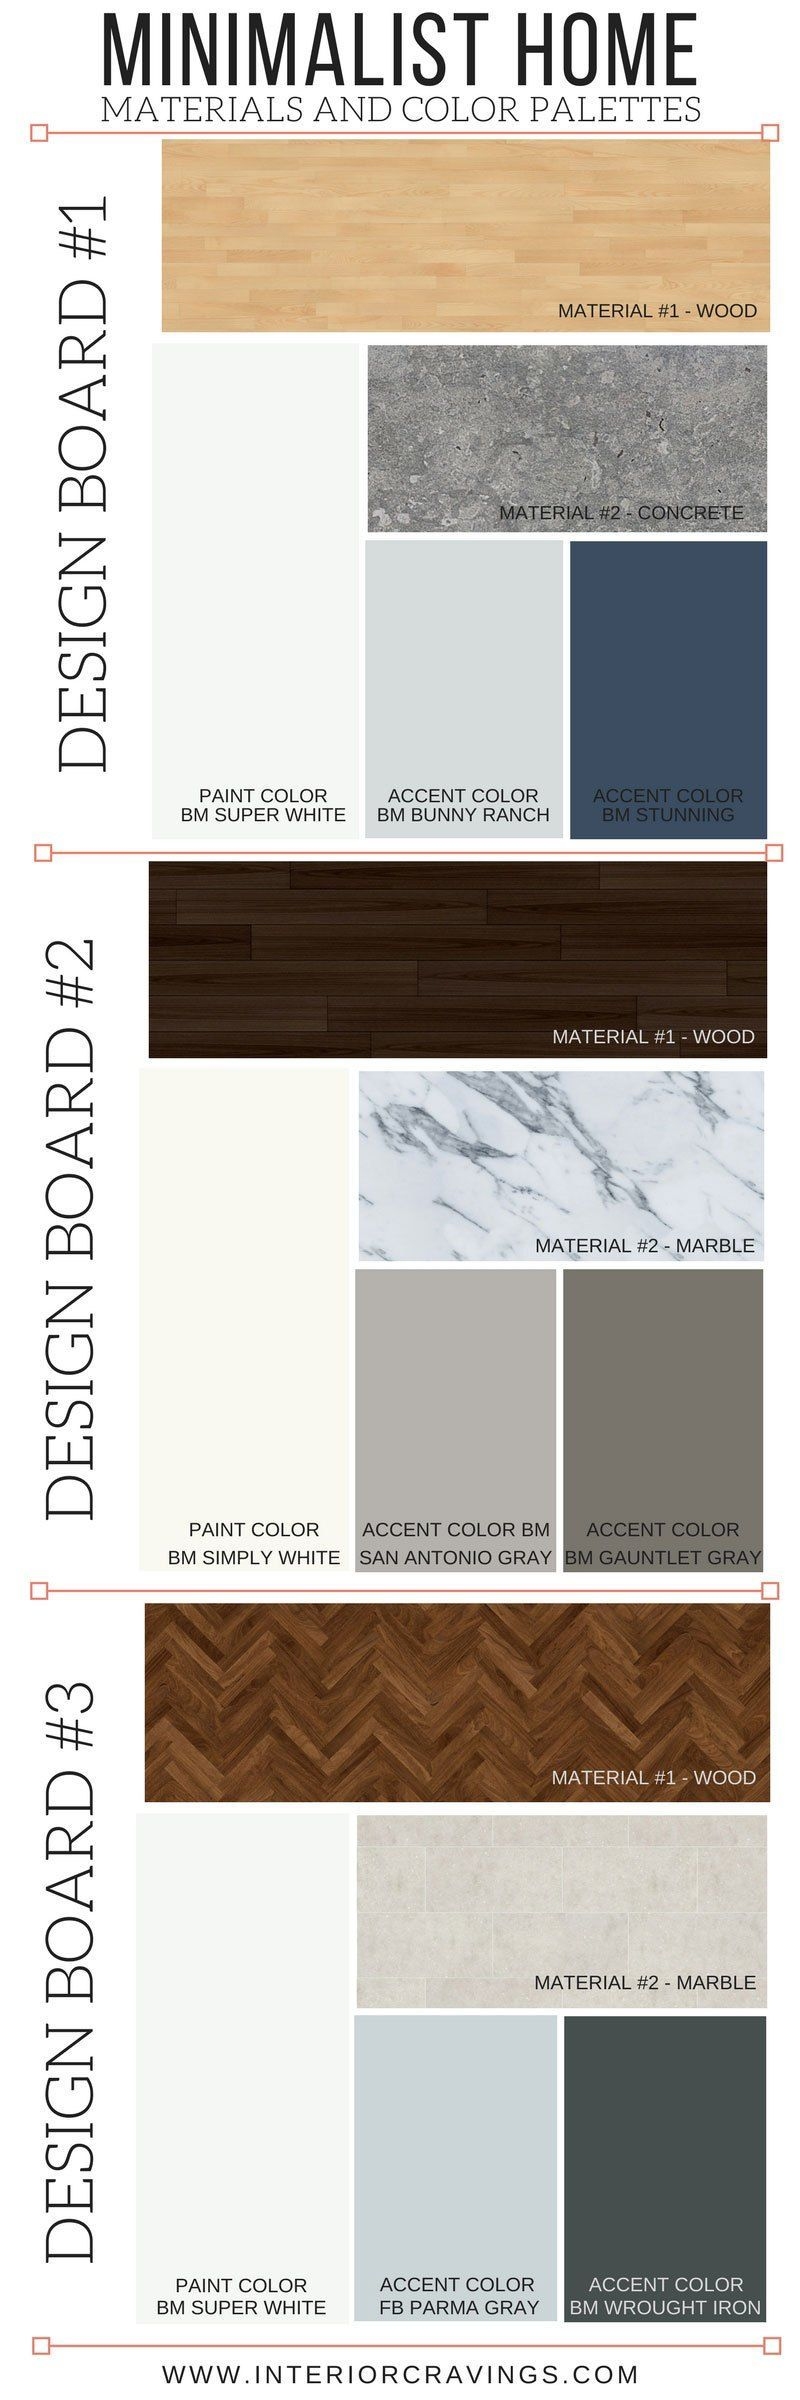 Minimalist Home Essentials Materials And Color Palette Interior